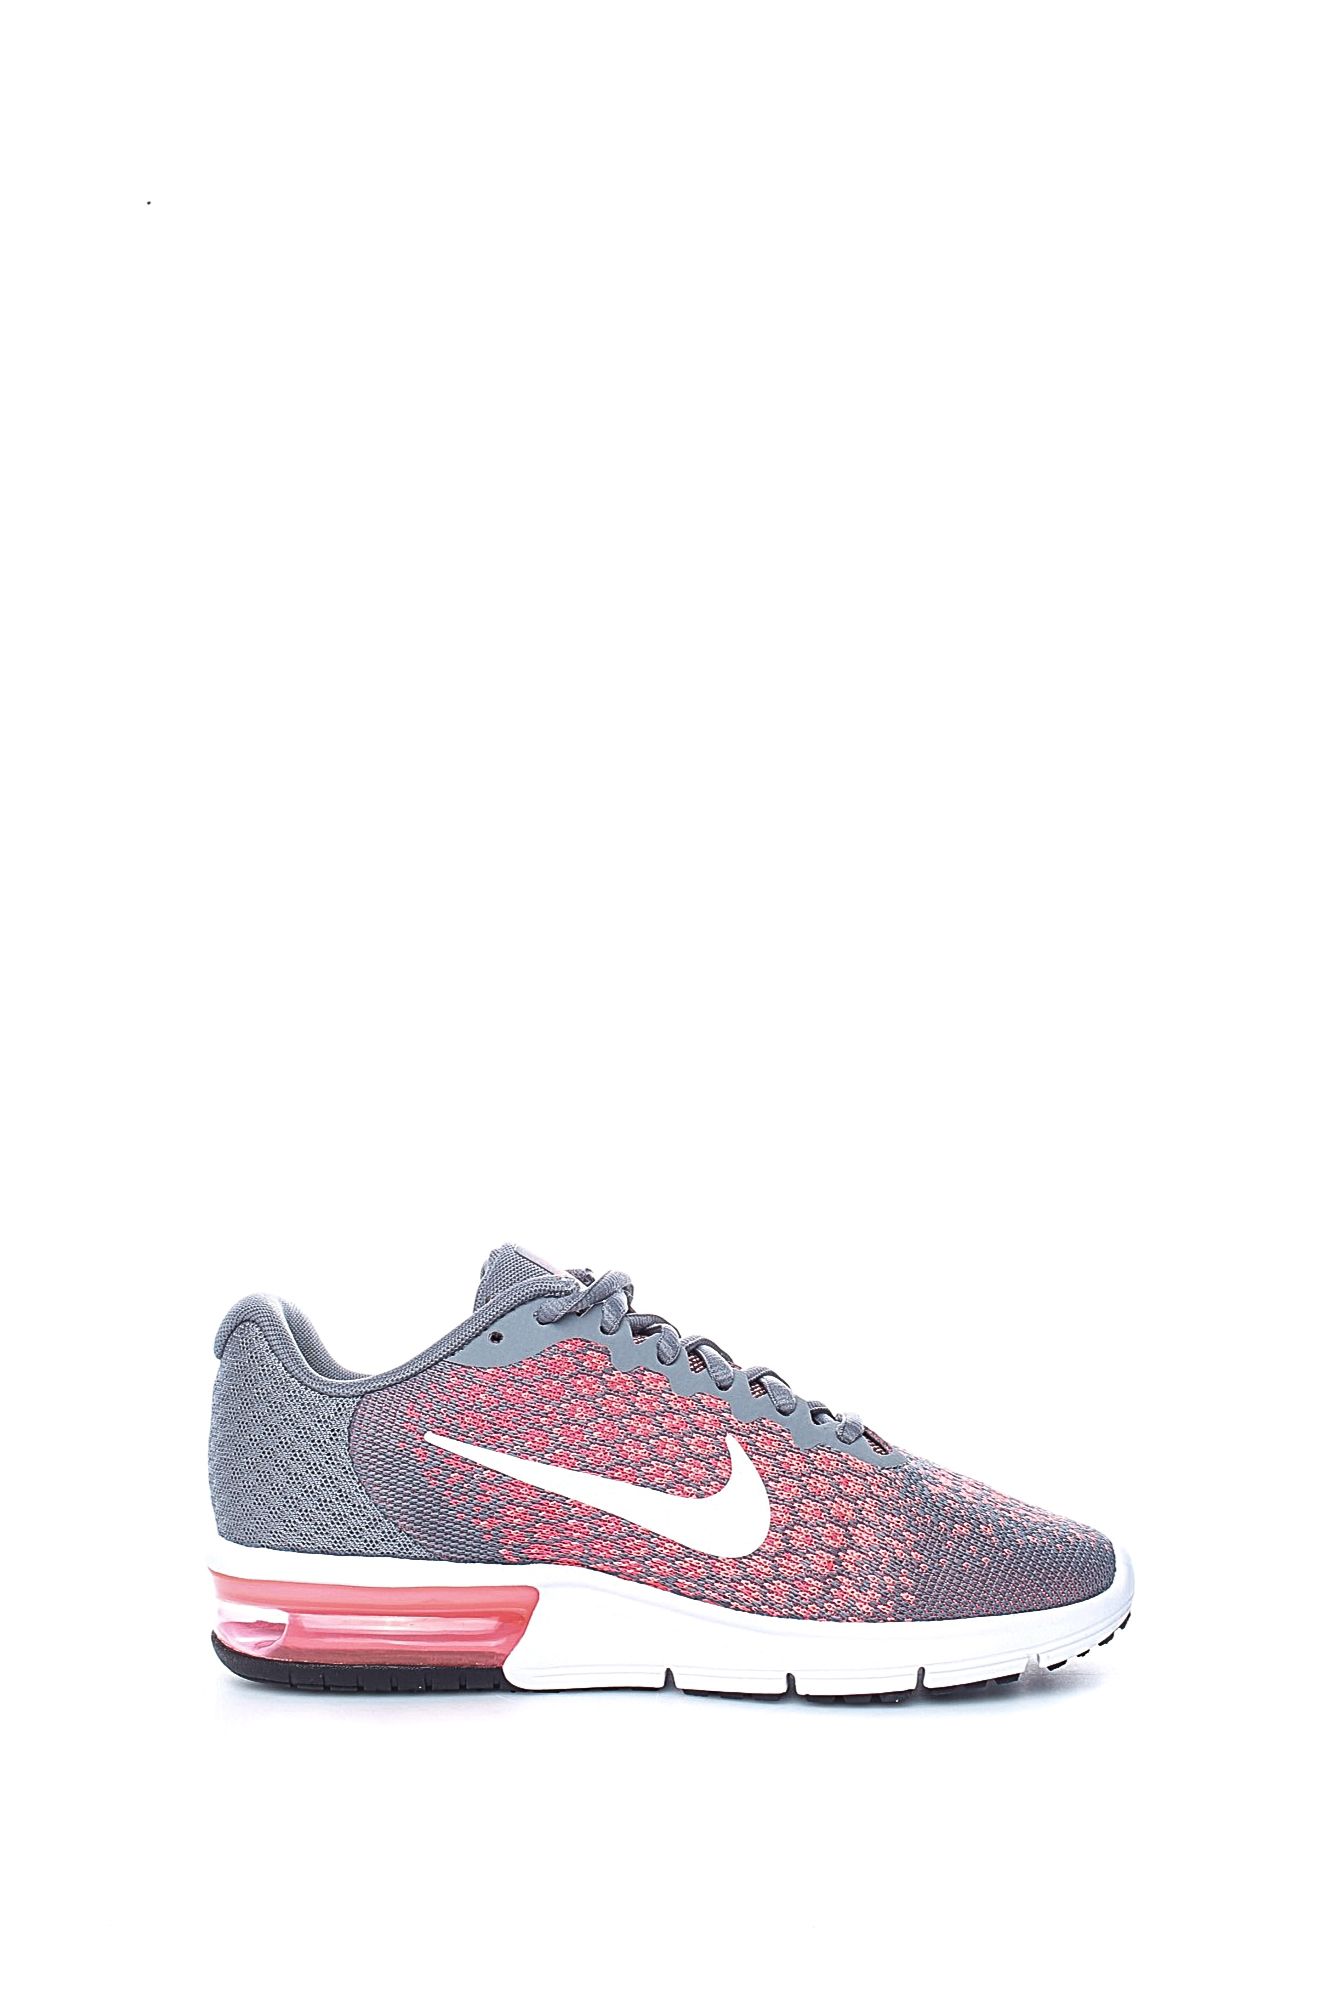 25e74daa01 NIKE – Γυναικεία αθλητικά παπούτσια Nike AIR MAX SEQUENT 2 γκρι – ροζ